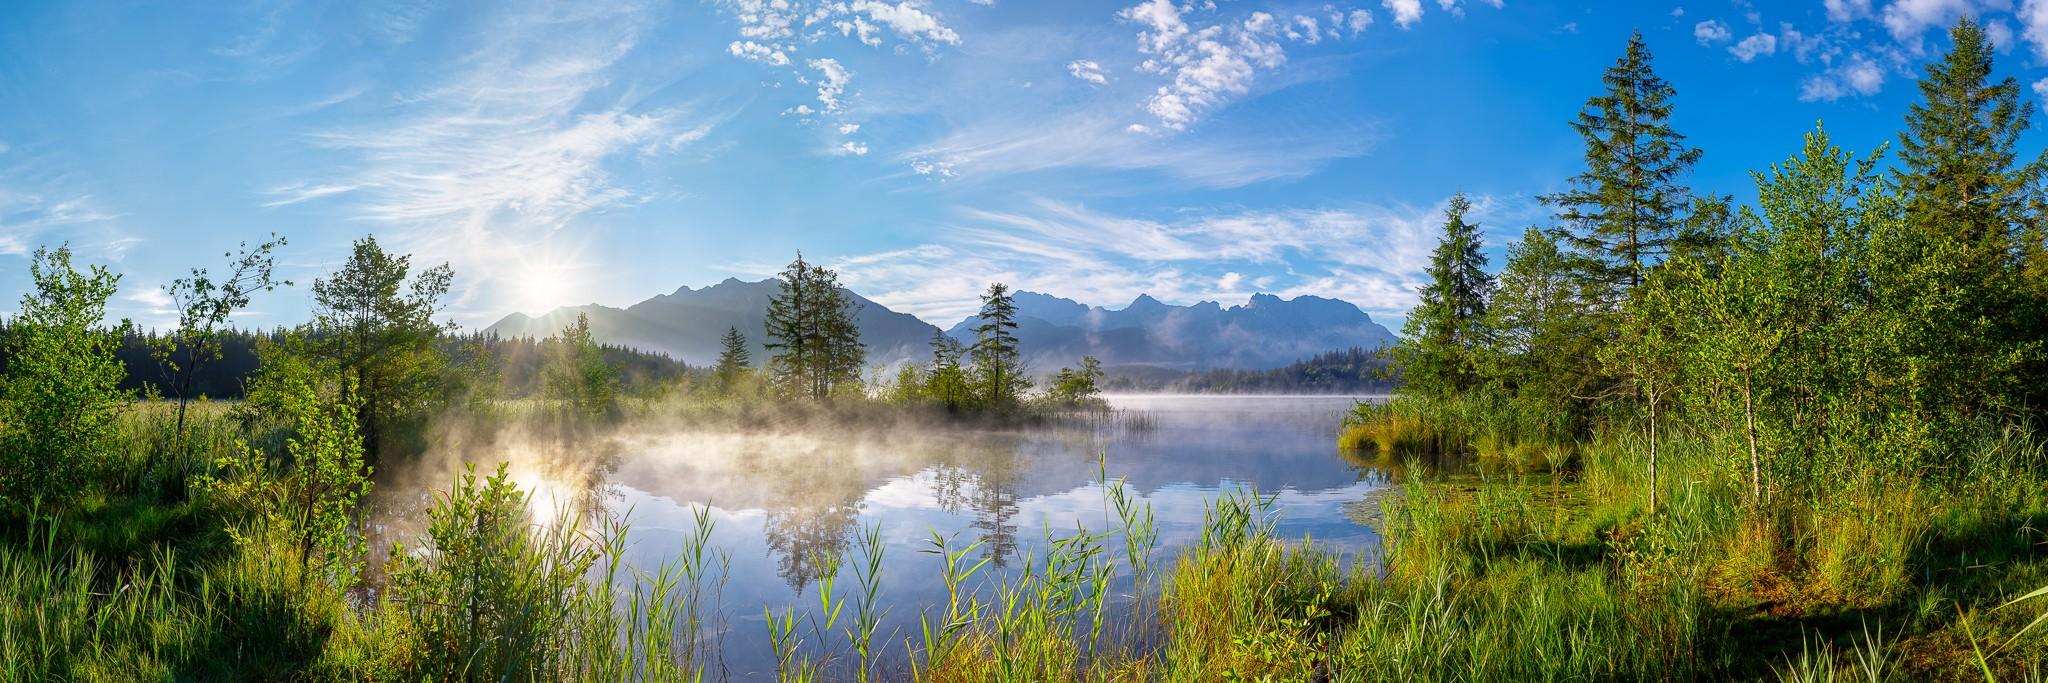 Barmsee am Morgen - Alpenwelt Karwendel